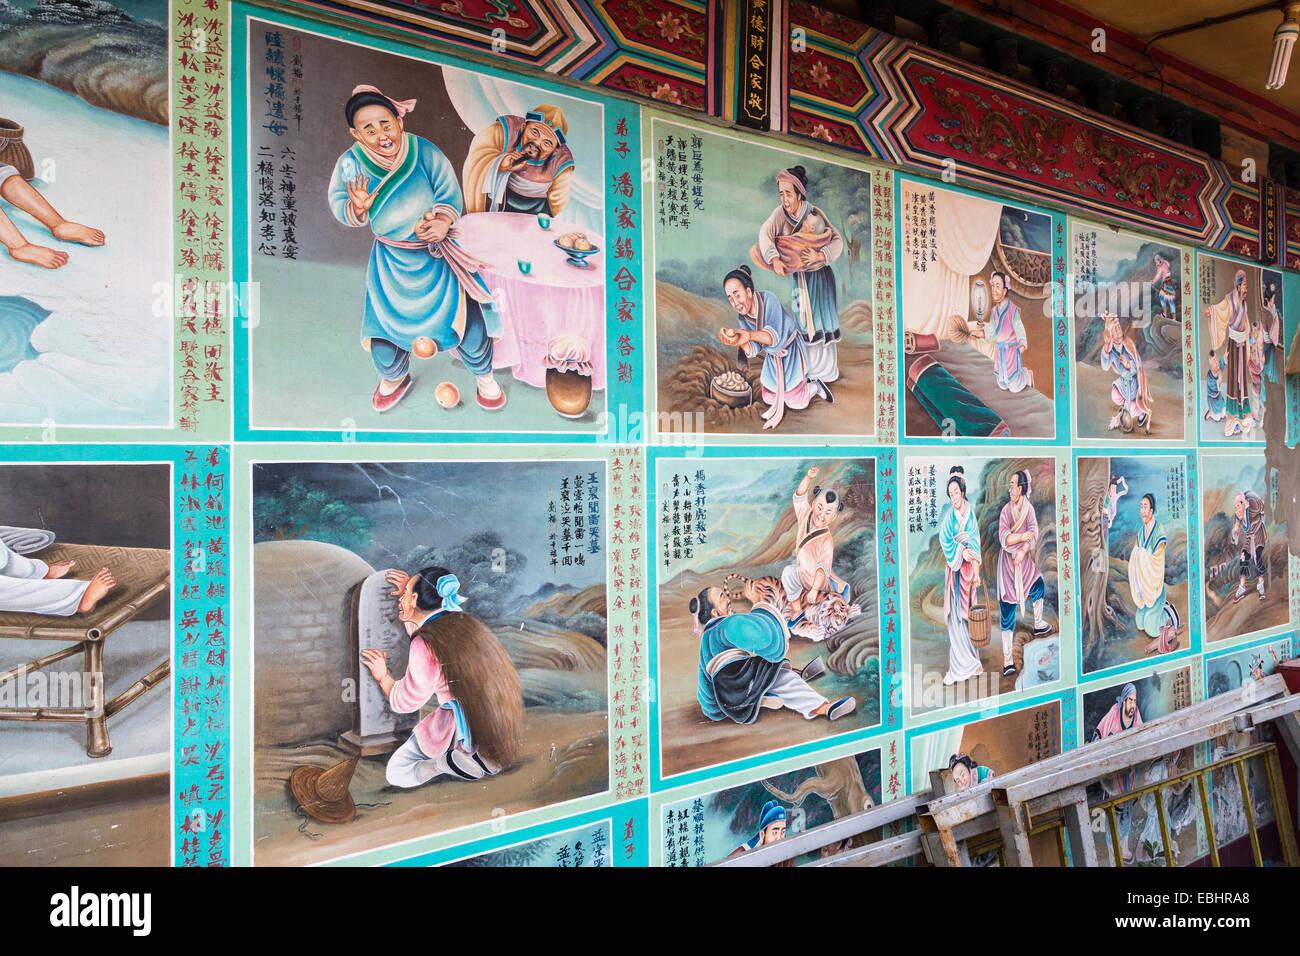 Story panel in Chinese on wall of Tua Pek Kong Chinese Temple, Miri, Sarawak, Malaysia - Stock Image